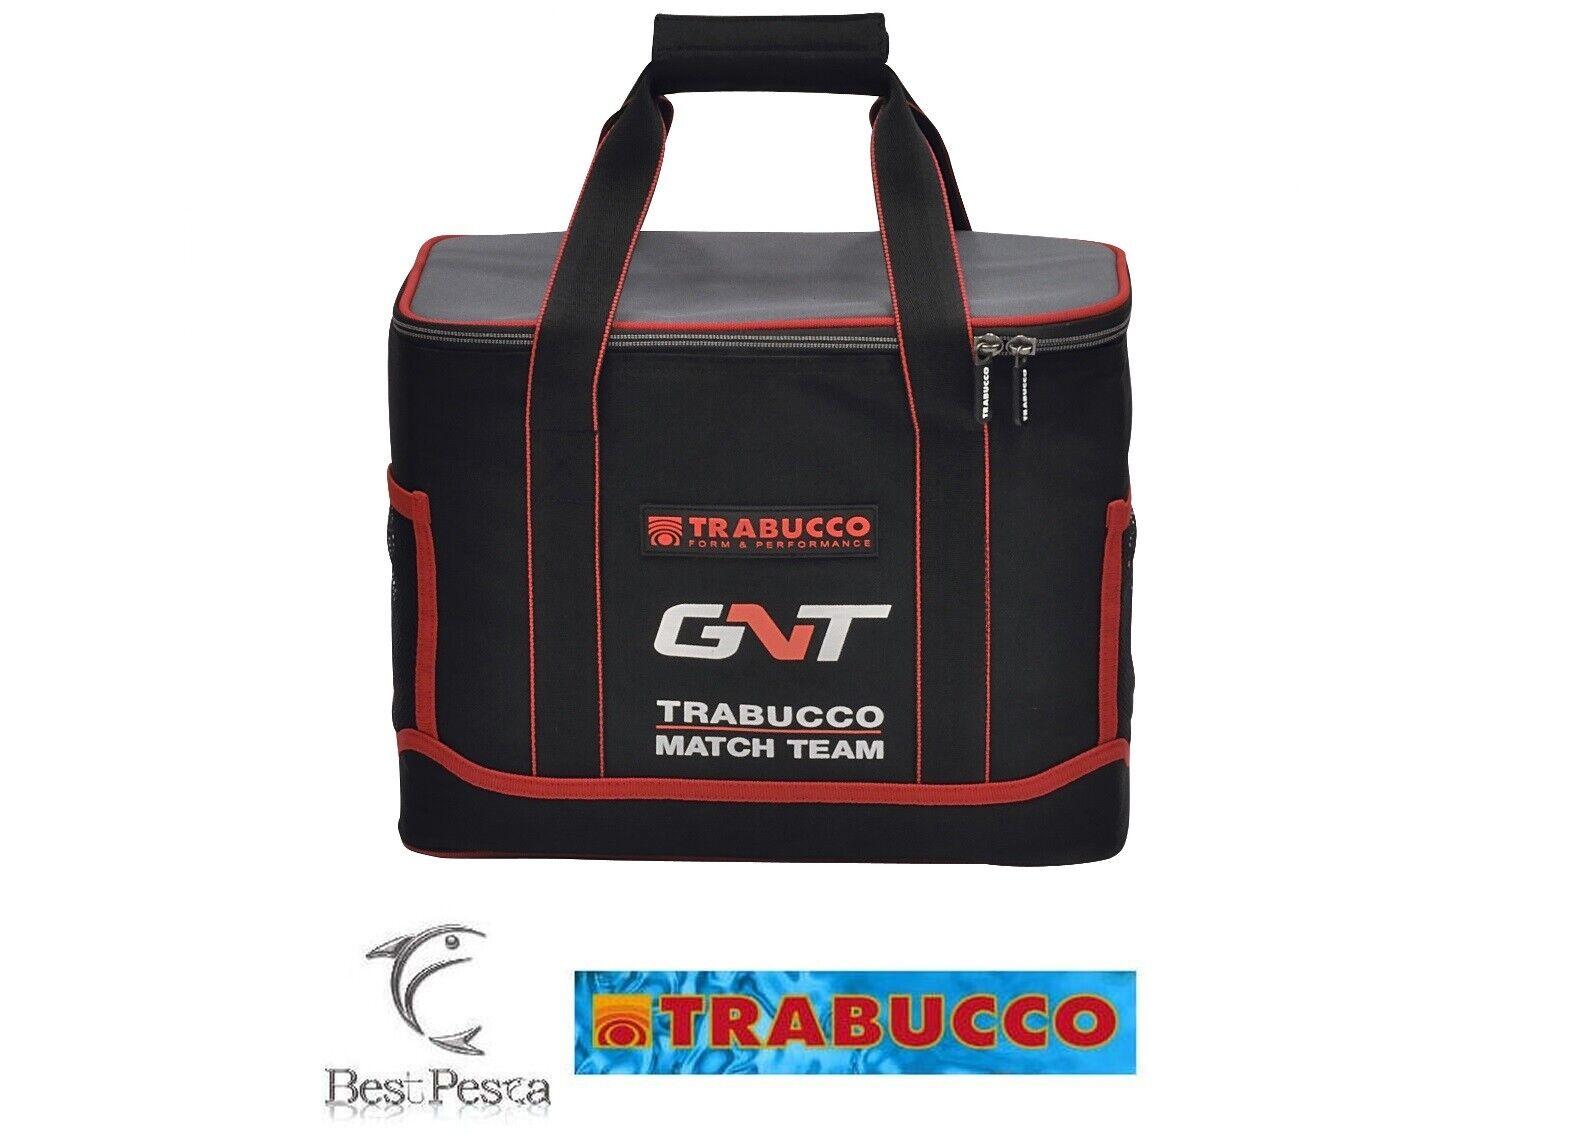 BORSA TERMICA - serie GNT MATCH TEAM TRABUCCO - cod  048-37-120